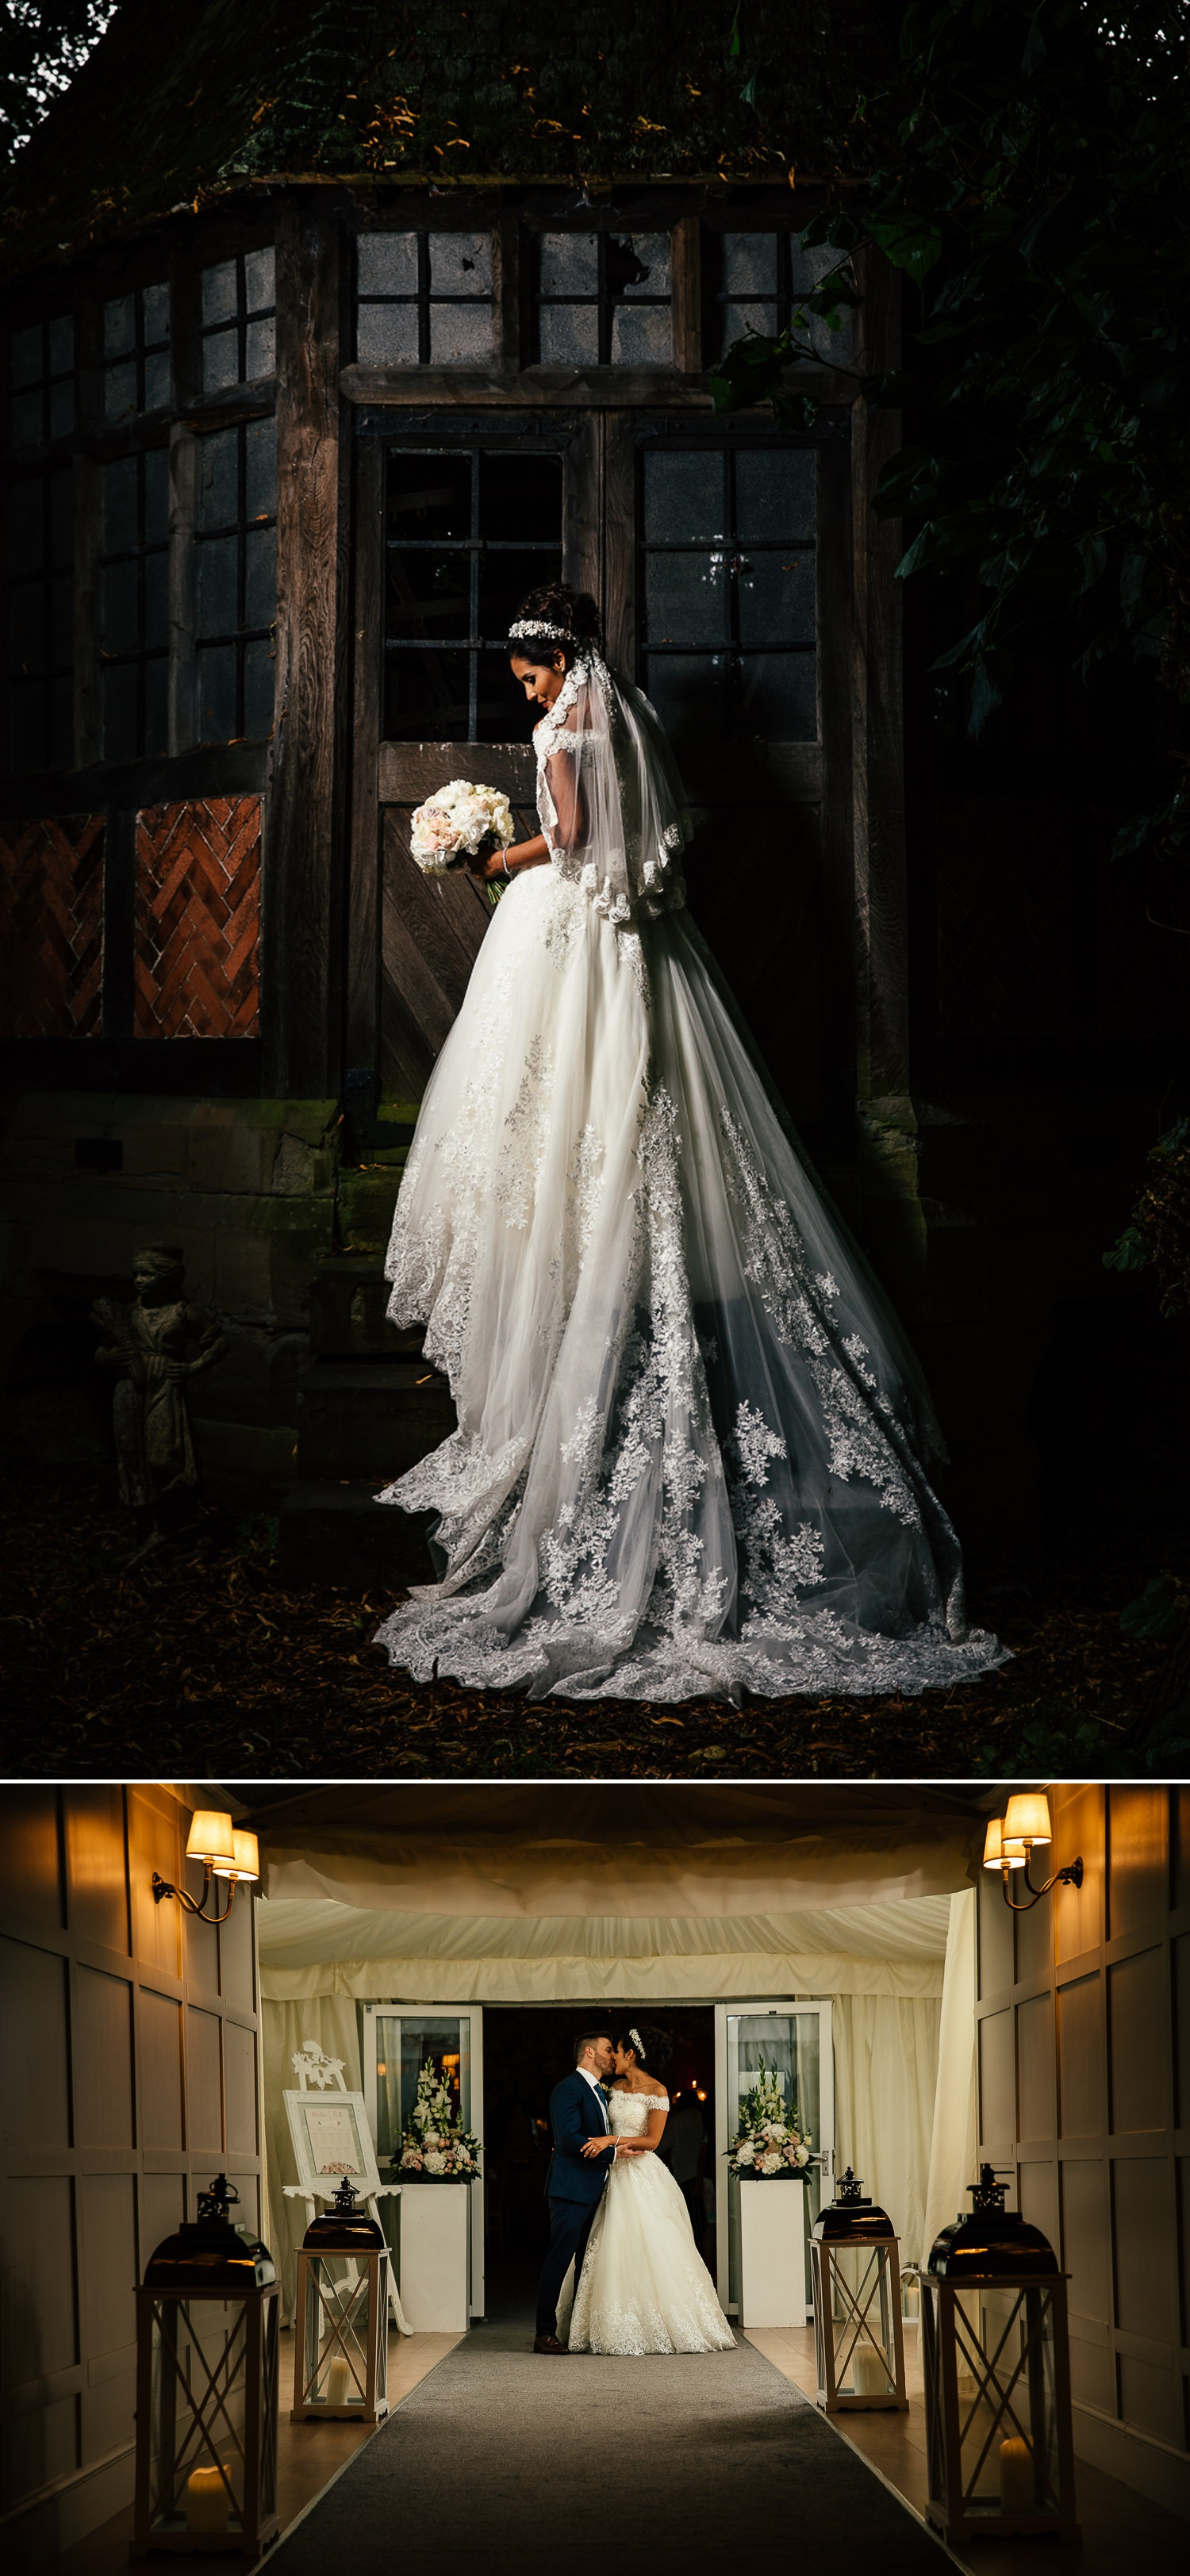 Wedding photographt bridal portraits of wedding at sougthon Hall, Chester, Cheshire